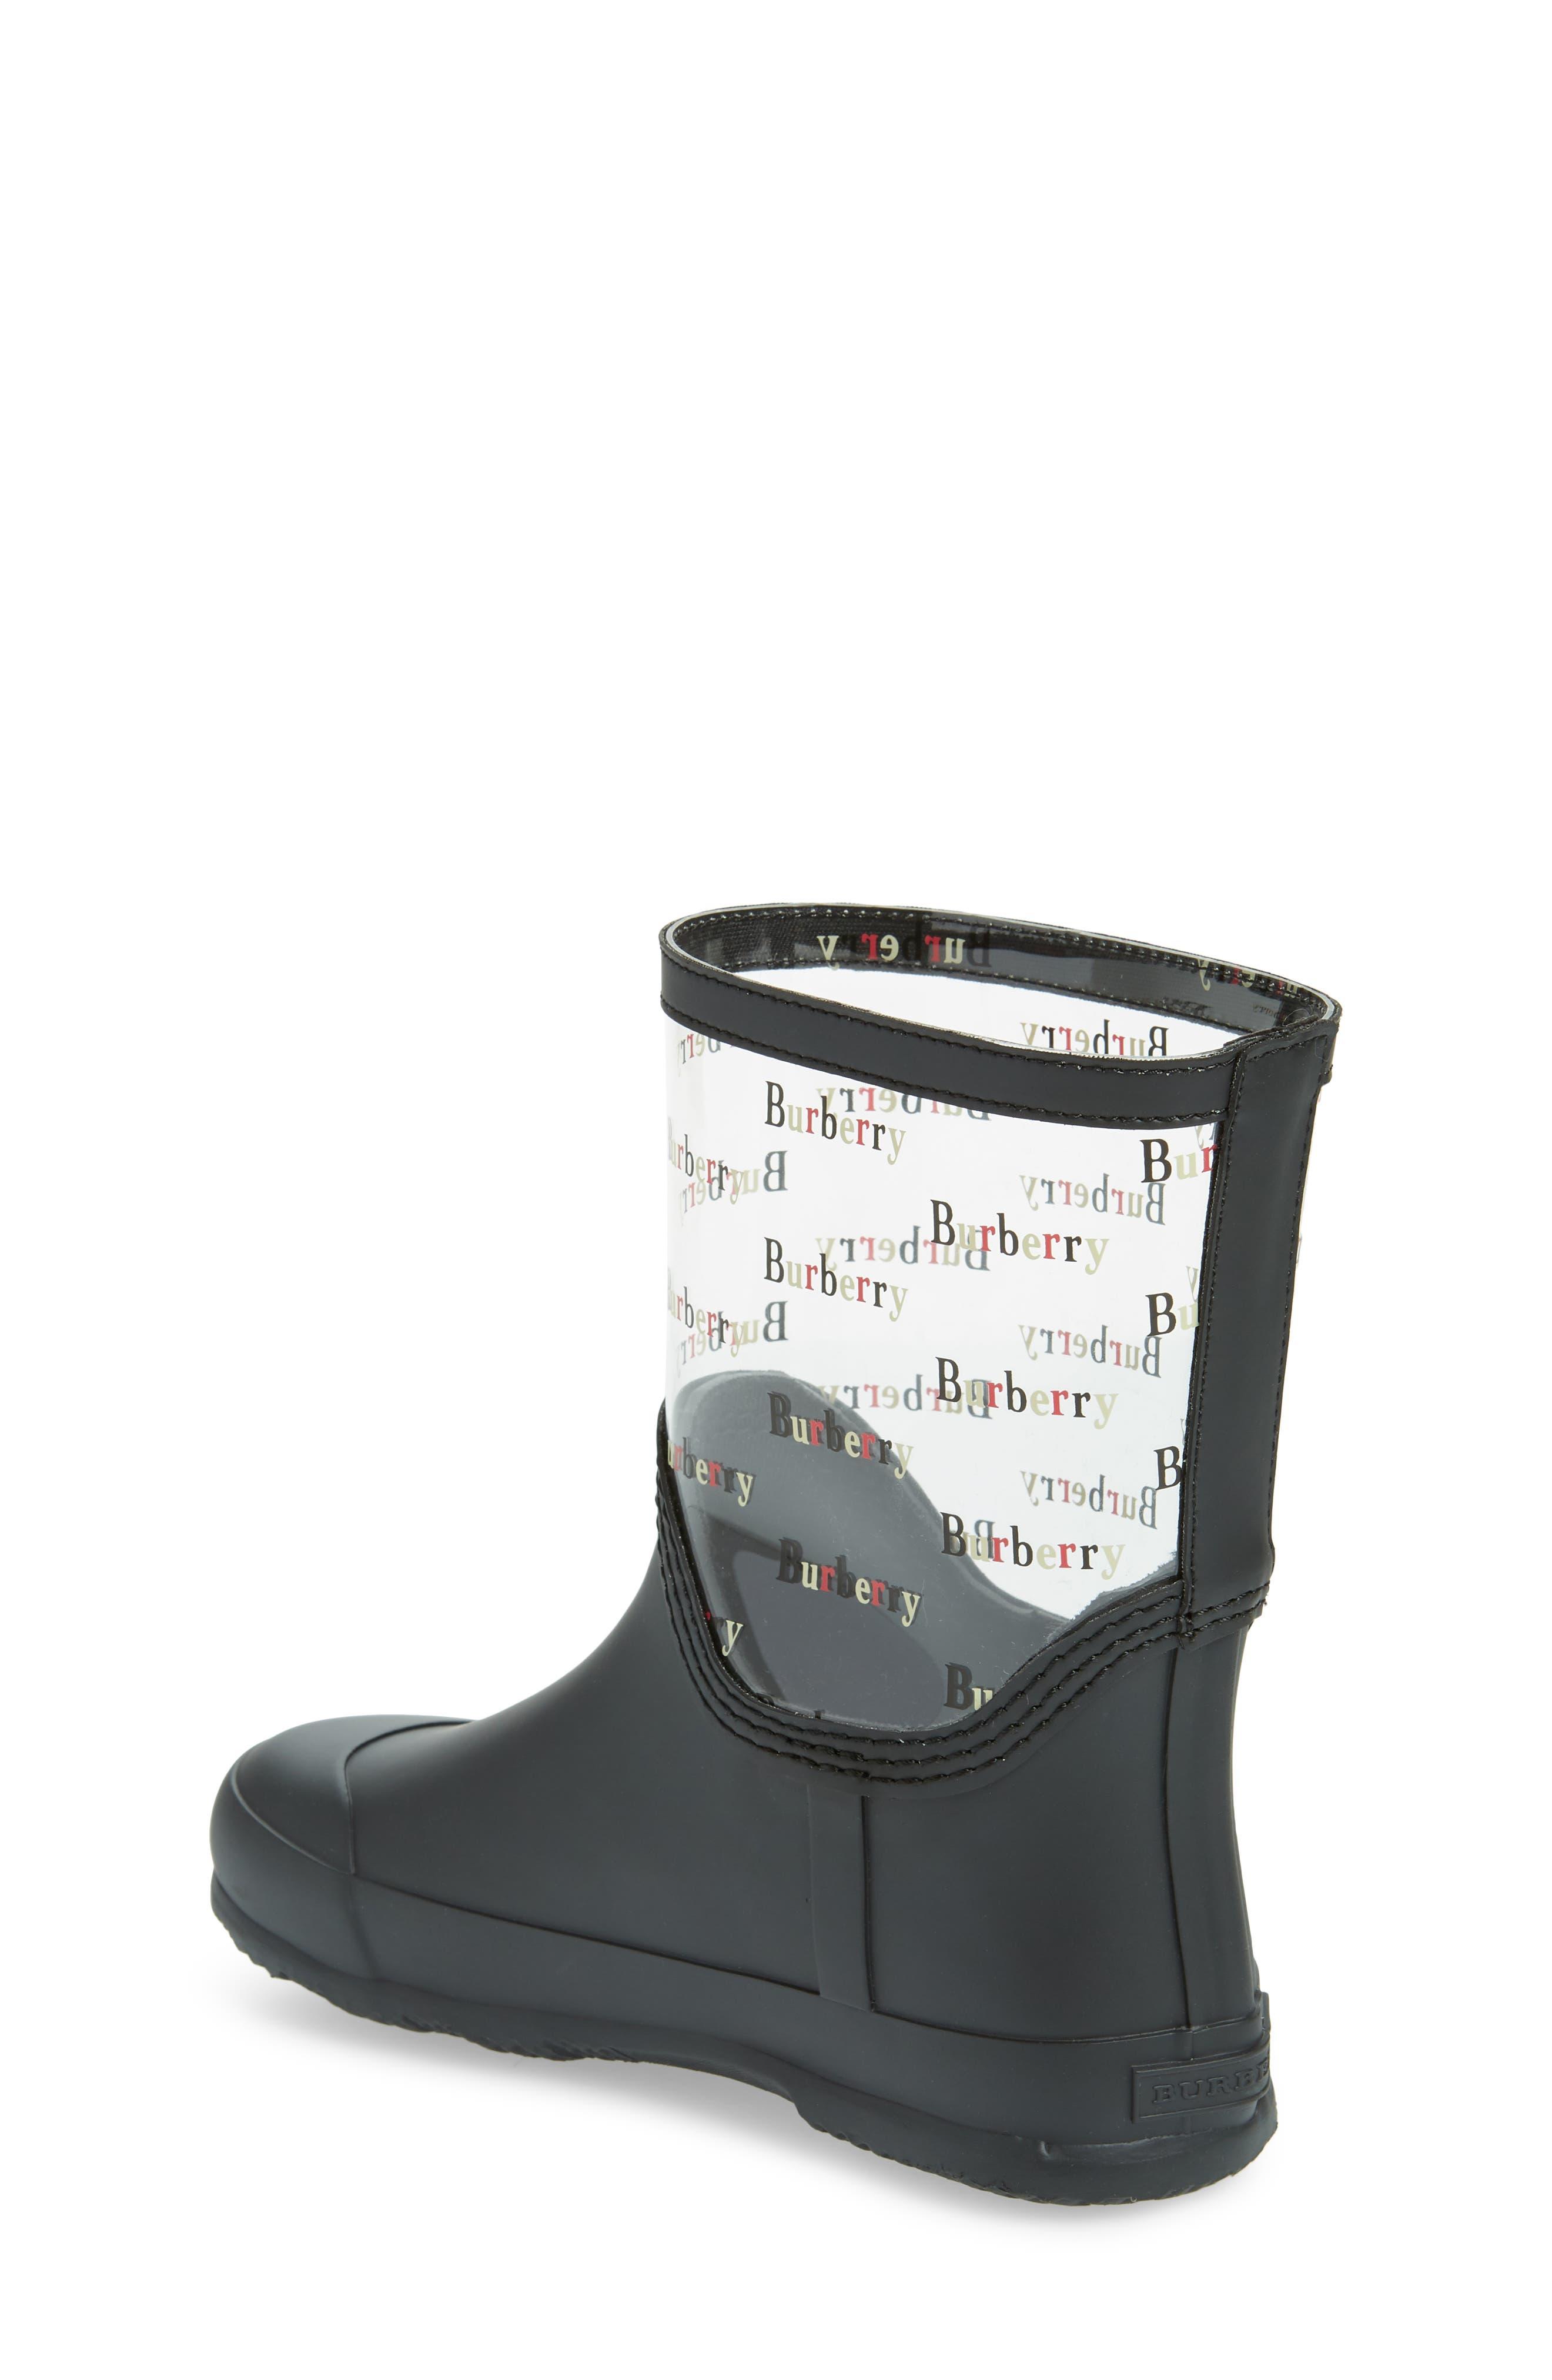 BURBERRY, Frosty Waterproof Rain Boot, Alternate thumbnail 2, color, BLACK